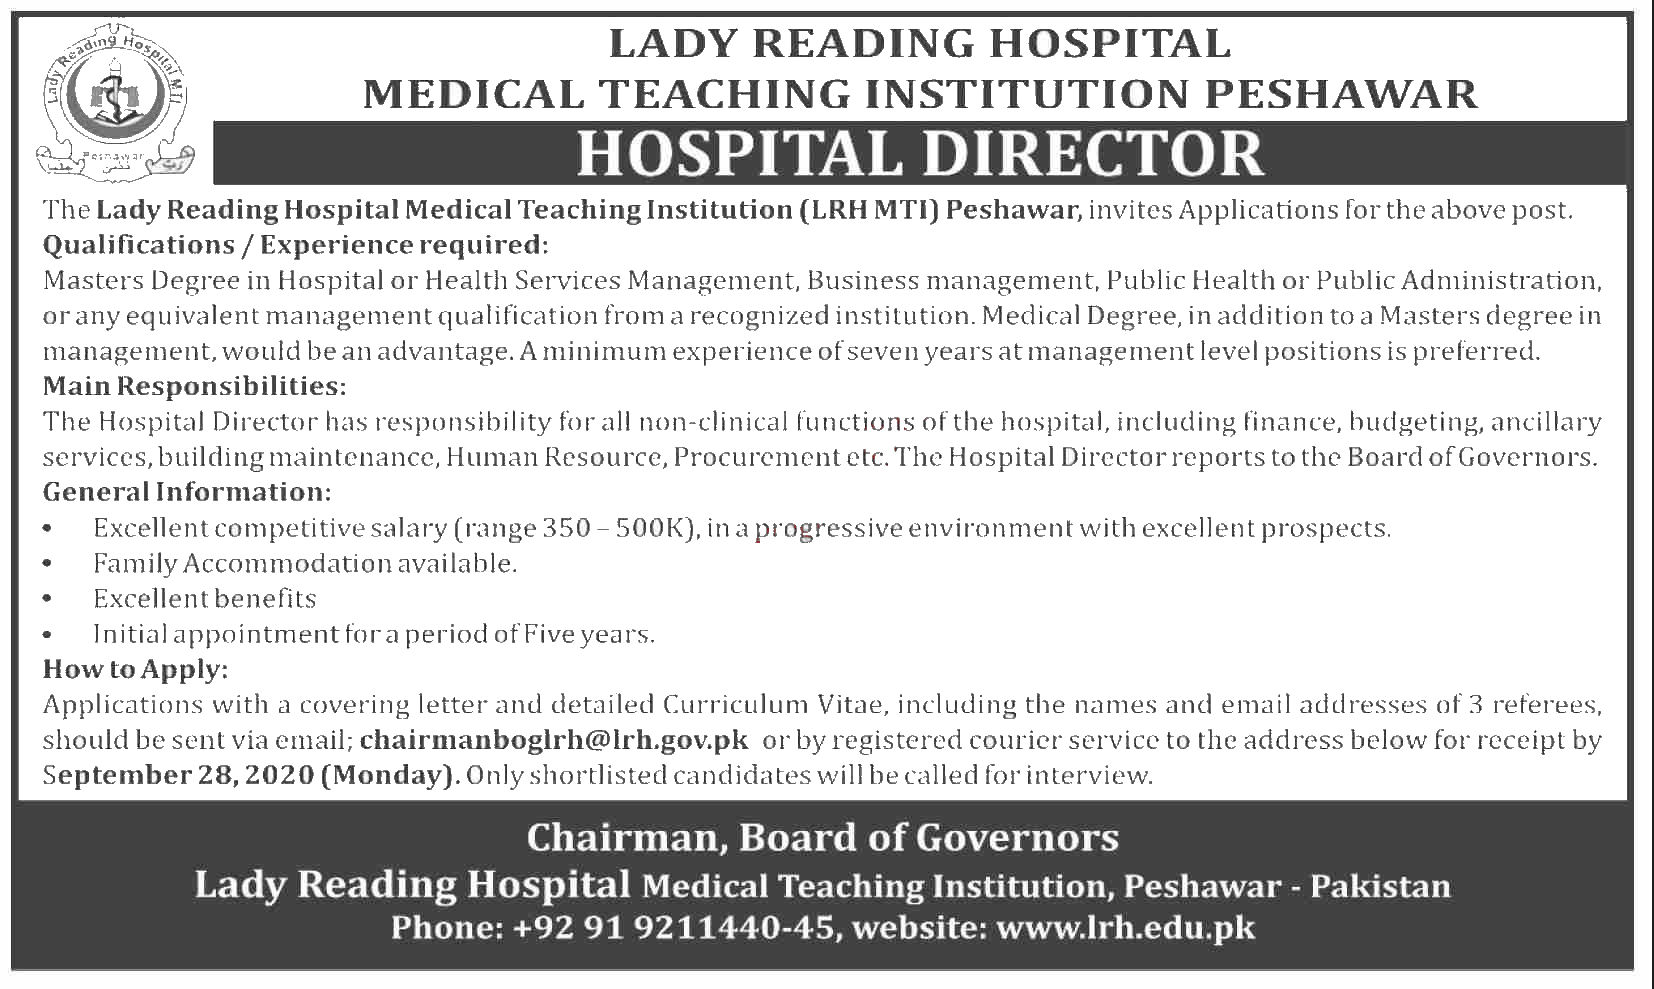 Jobs in Lady Reading Hospital LRH MTI Peshawar 10 September, 2020